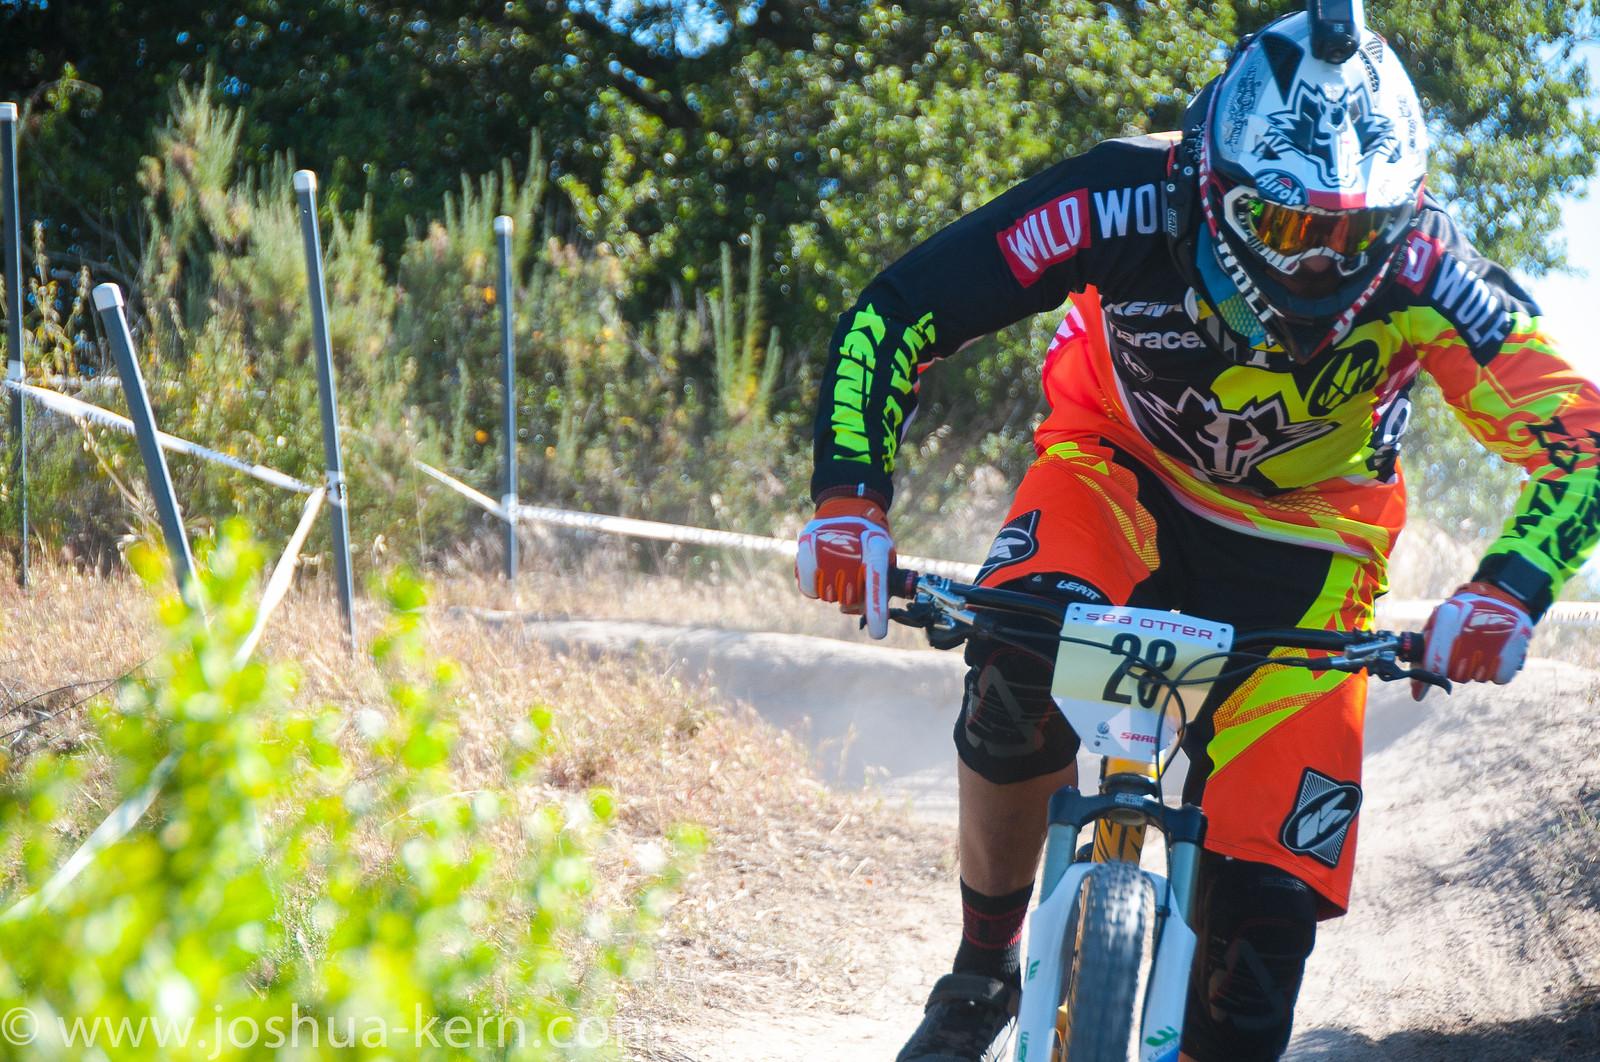 Cedric (1 of 1) - jkern620 - Mountain Biking Pictures - Vital MTB